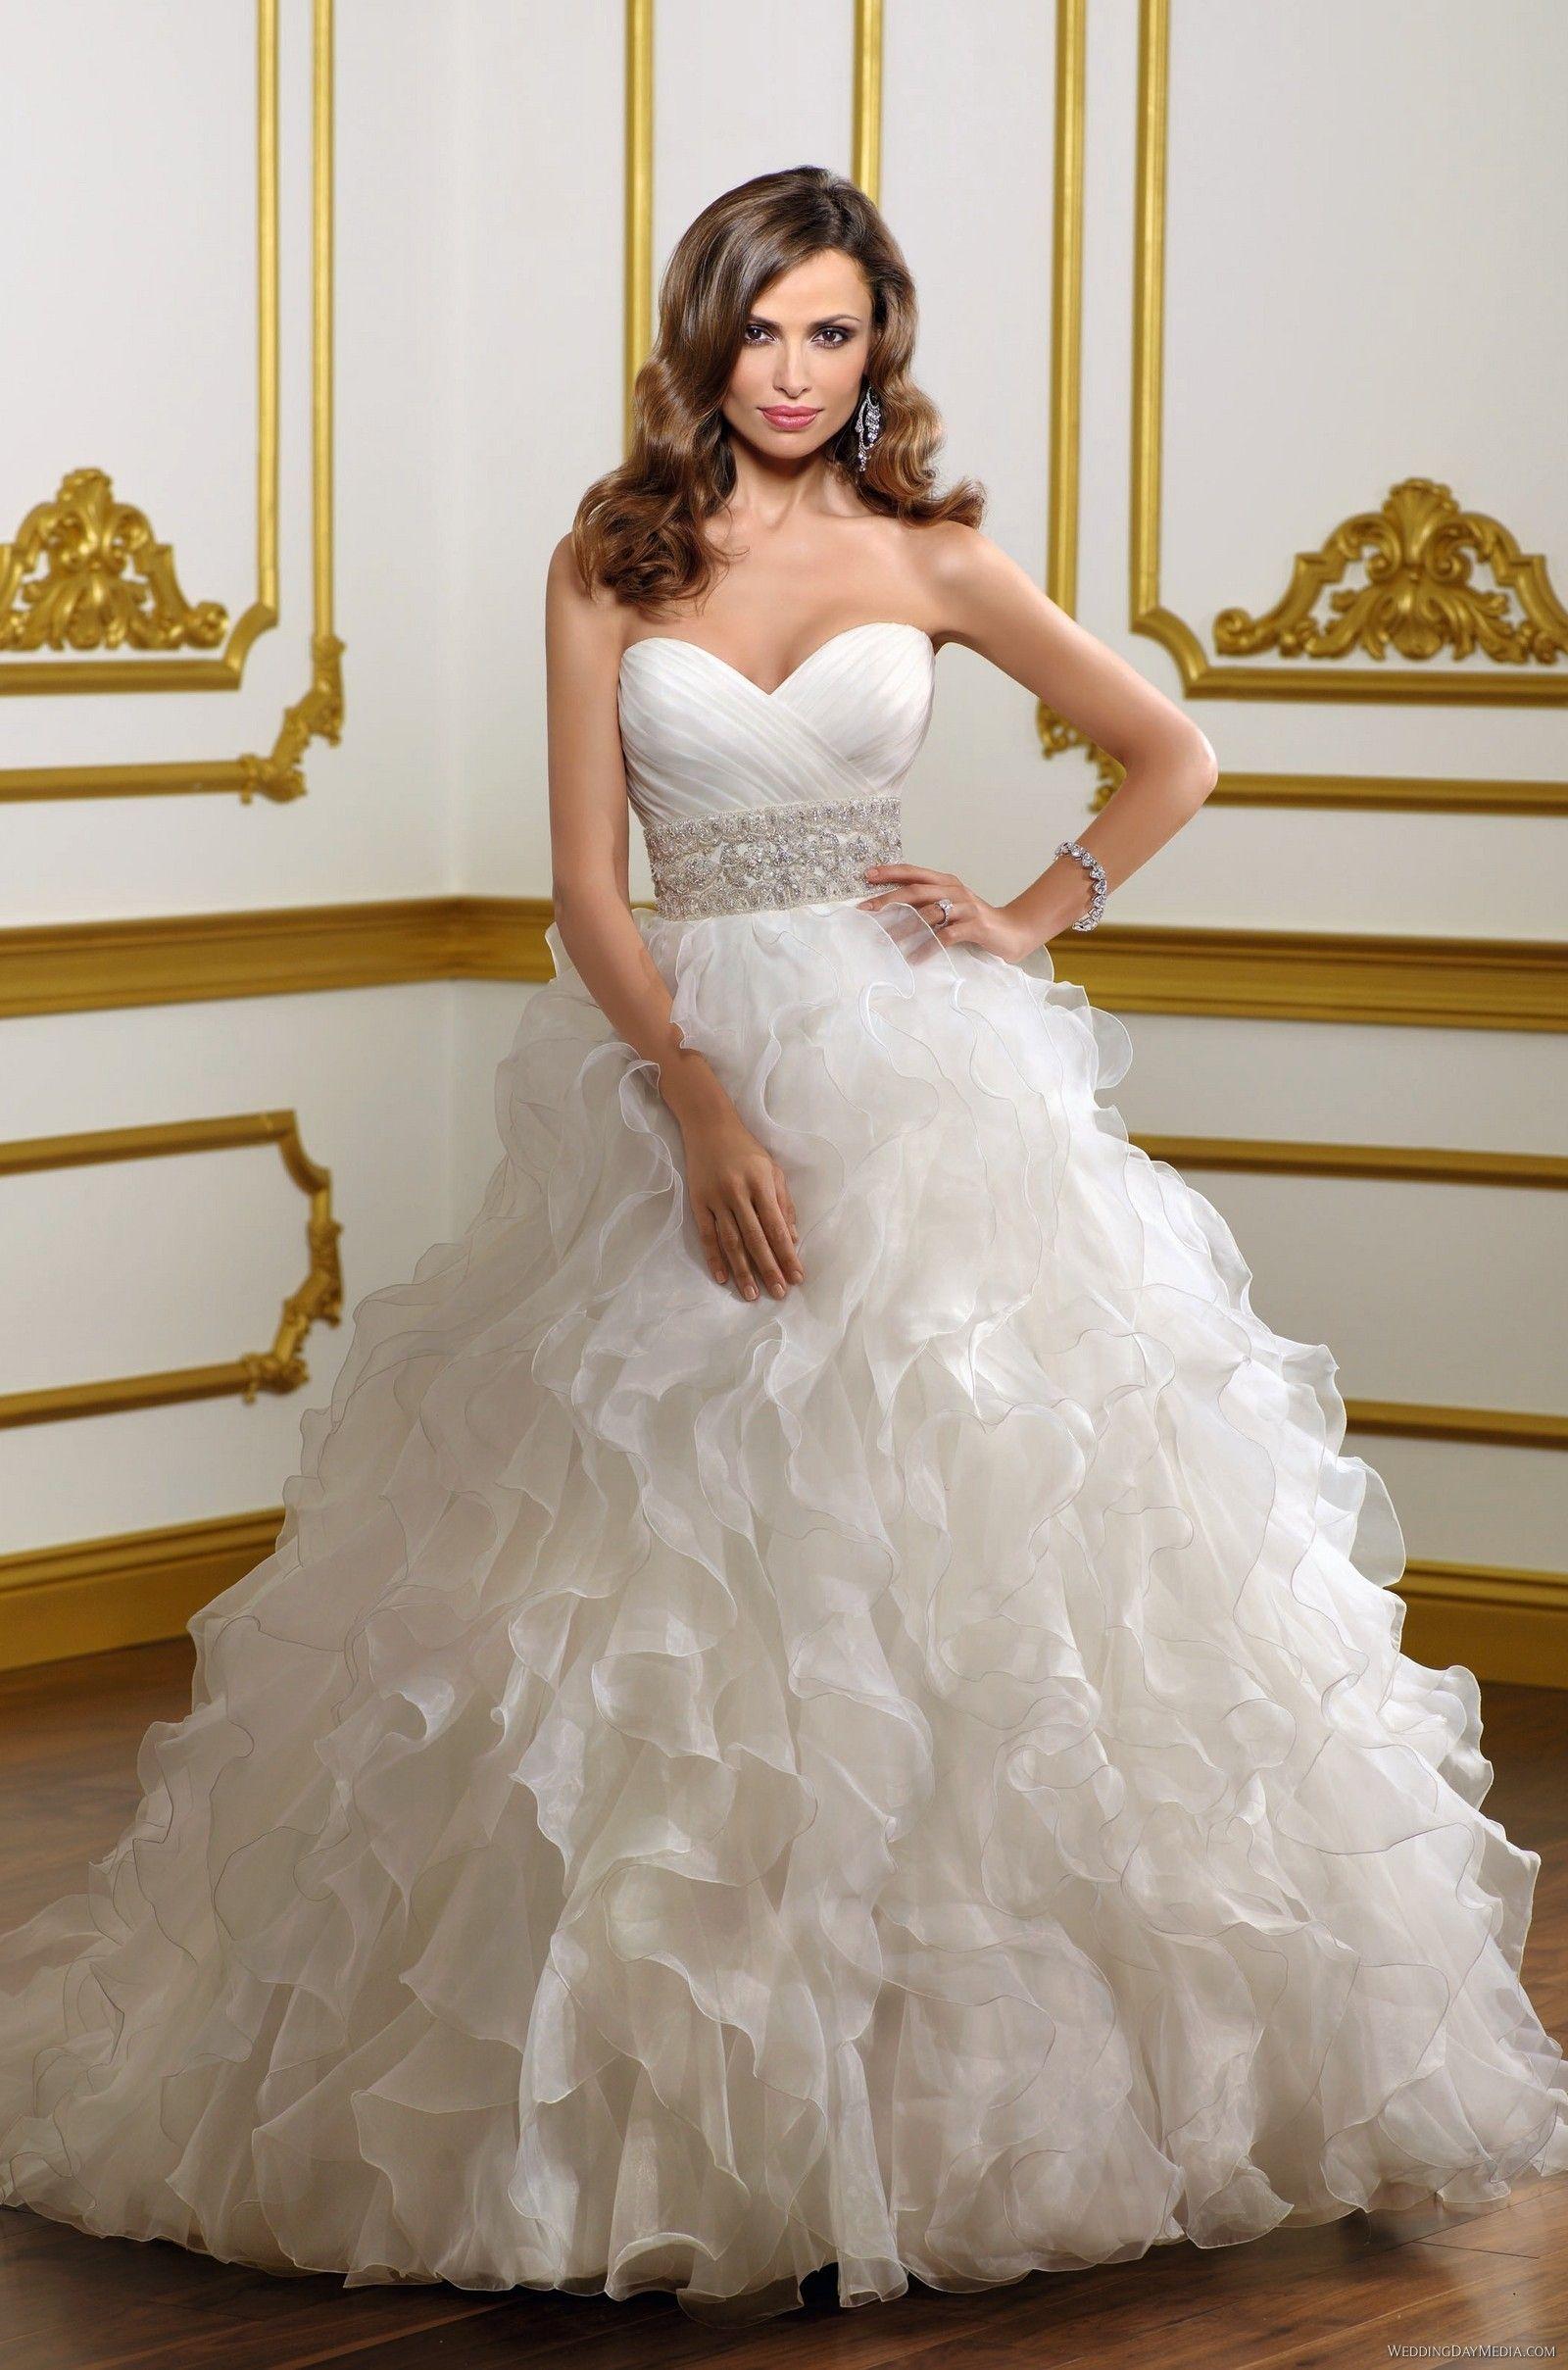 Fluffy organza dress from Bridal by Mori Lee #bride #bridal #dress ...